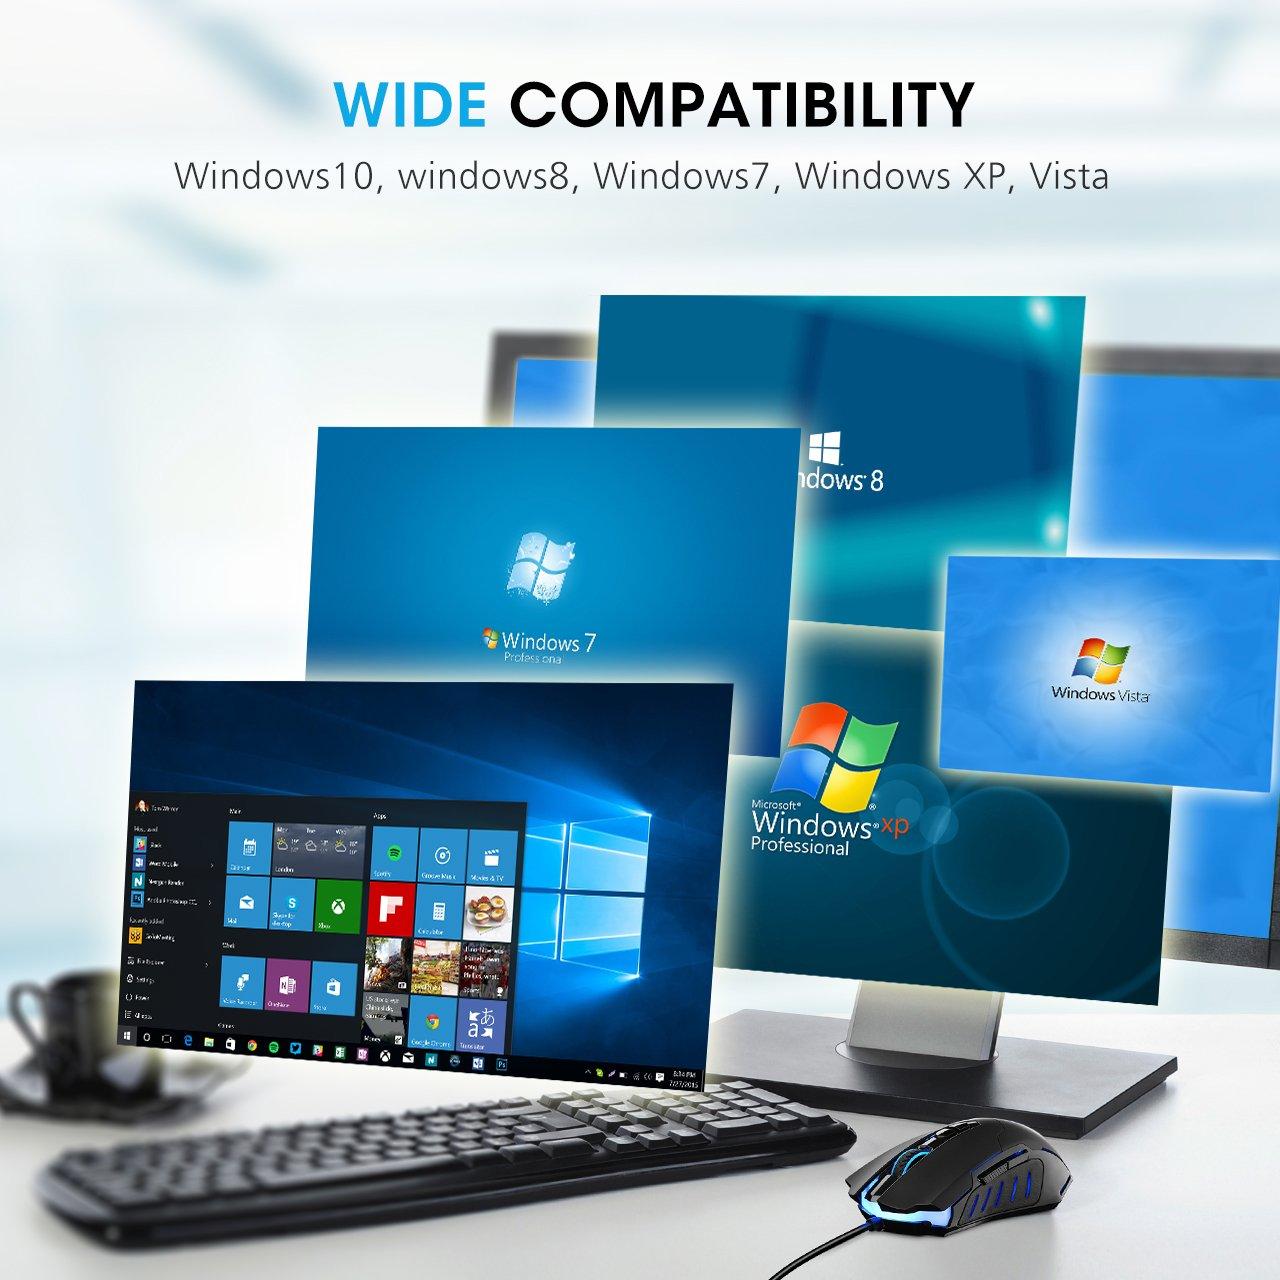 PICTEK Gaming Mouse Wired [7200 DPI] [Programmable] [Breathing Light] Ergonomic Game USB Computer Mice RGB Gamer Desktop Laptop PC Gaming Mouse, 7 Buttons for Windows 7/8/10/XP Vista Linux, Black by PICTEK (Image #7)